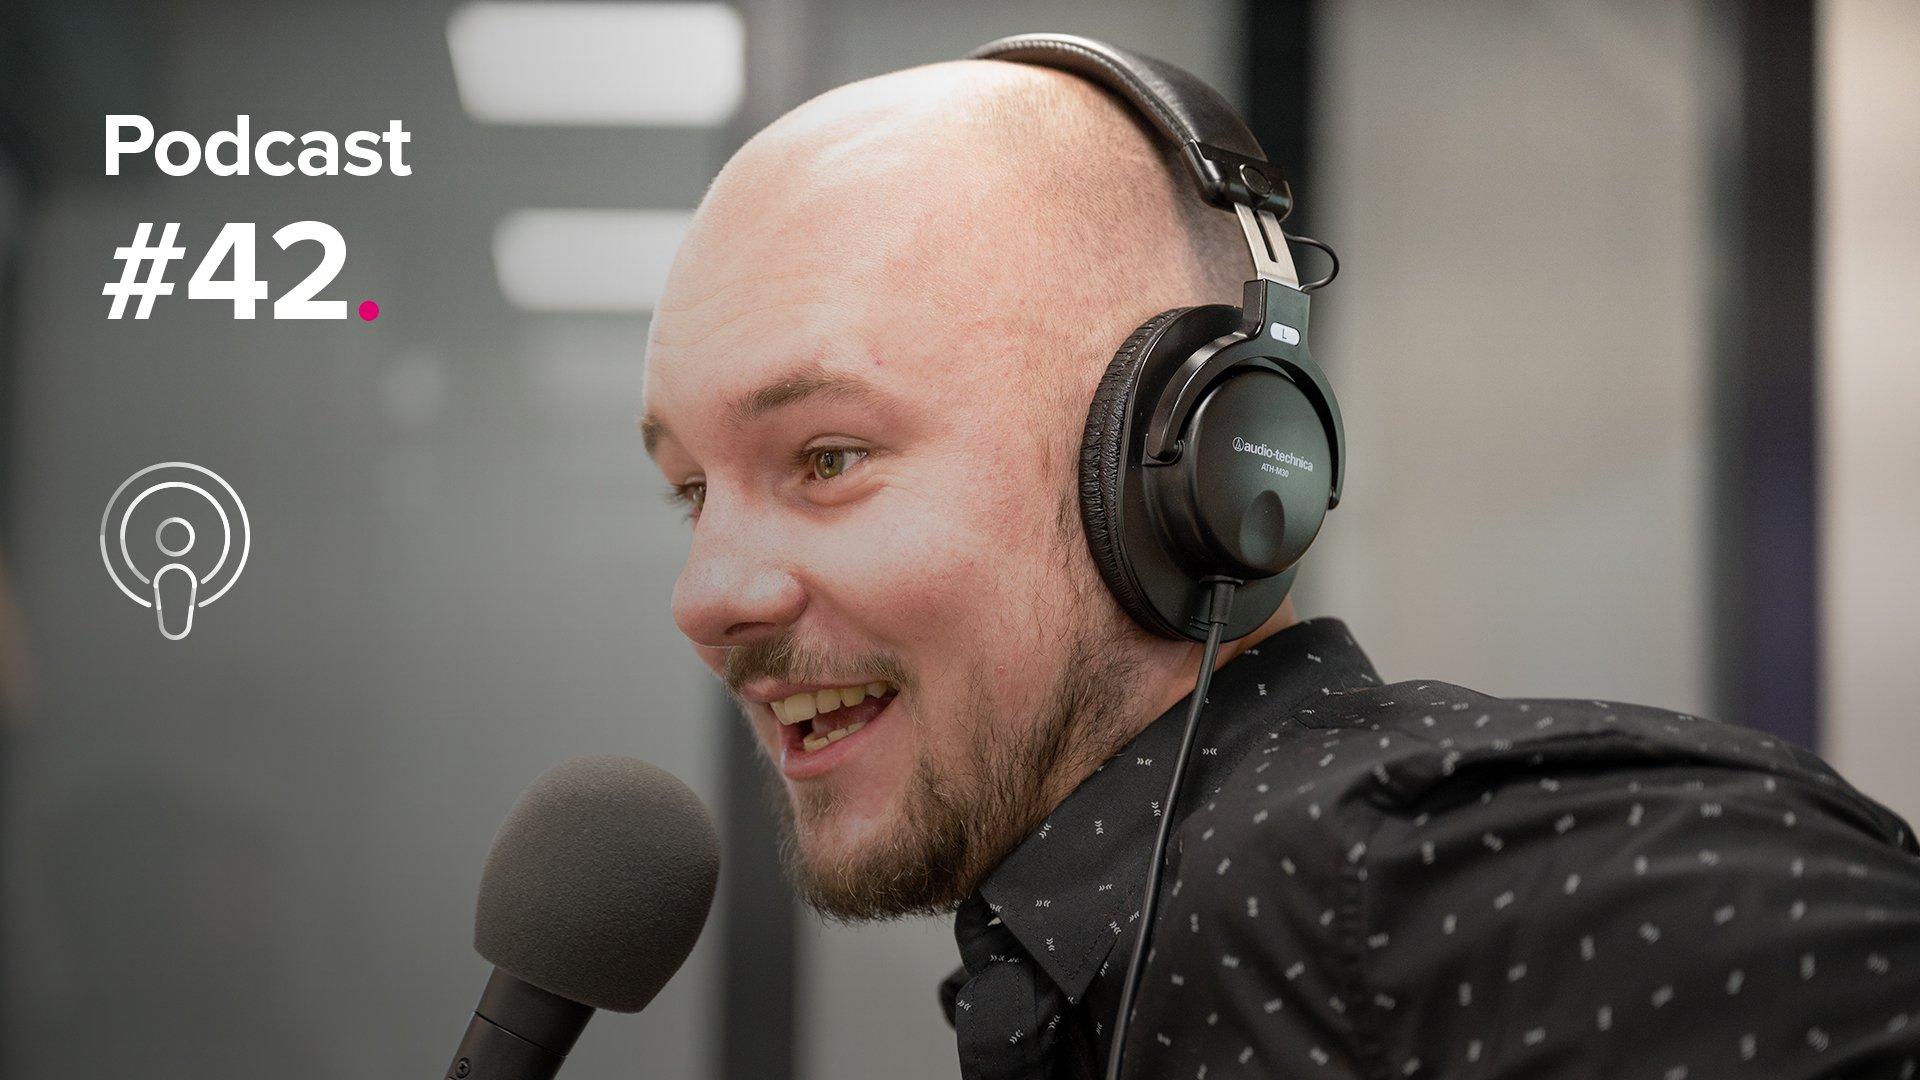 Podcast Digital Brains #42